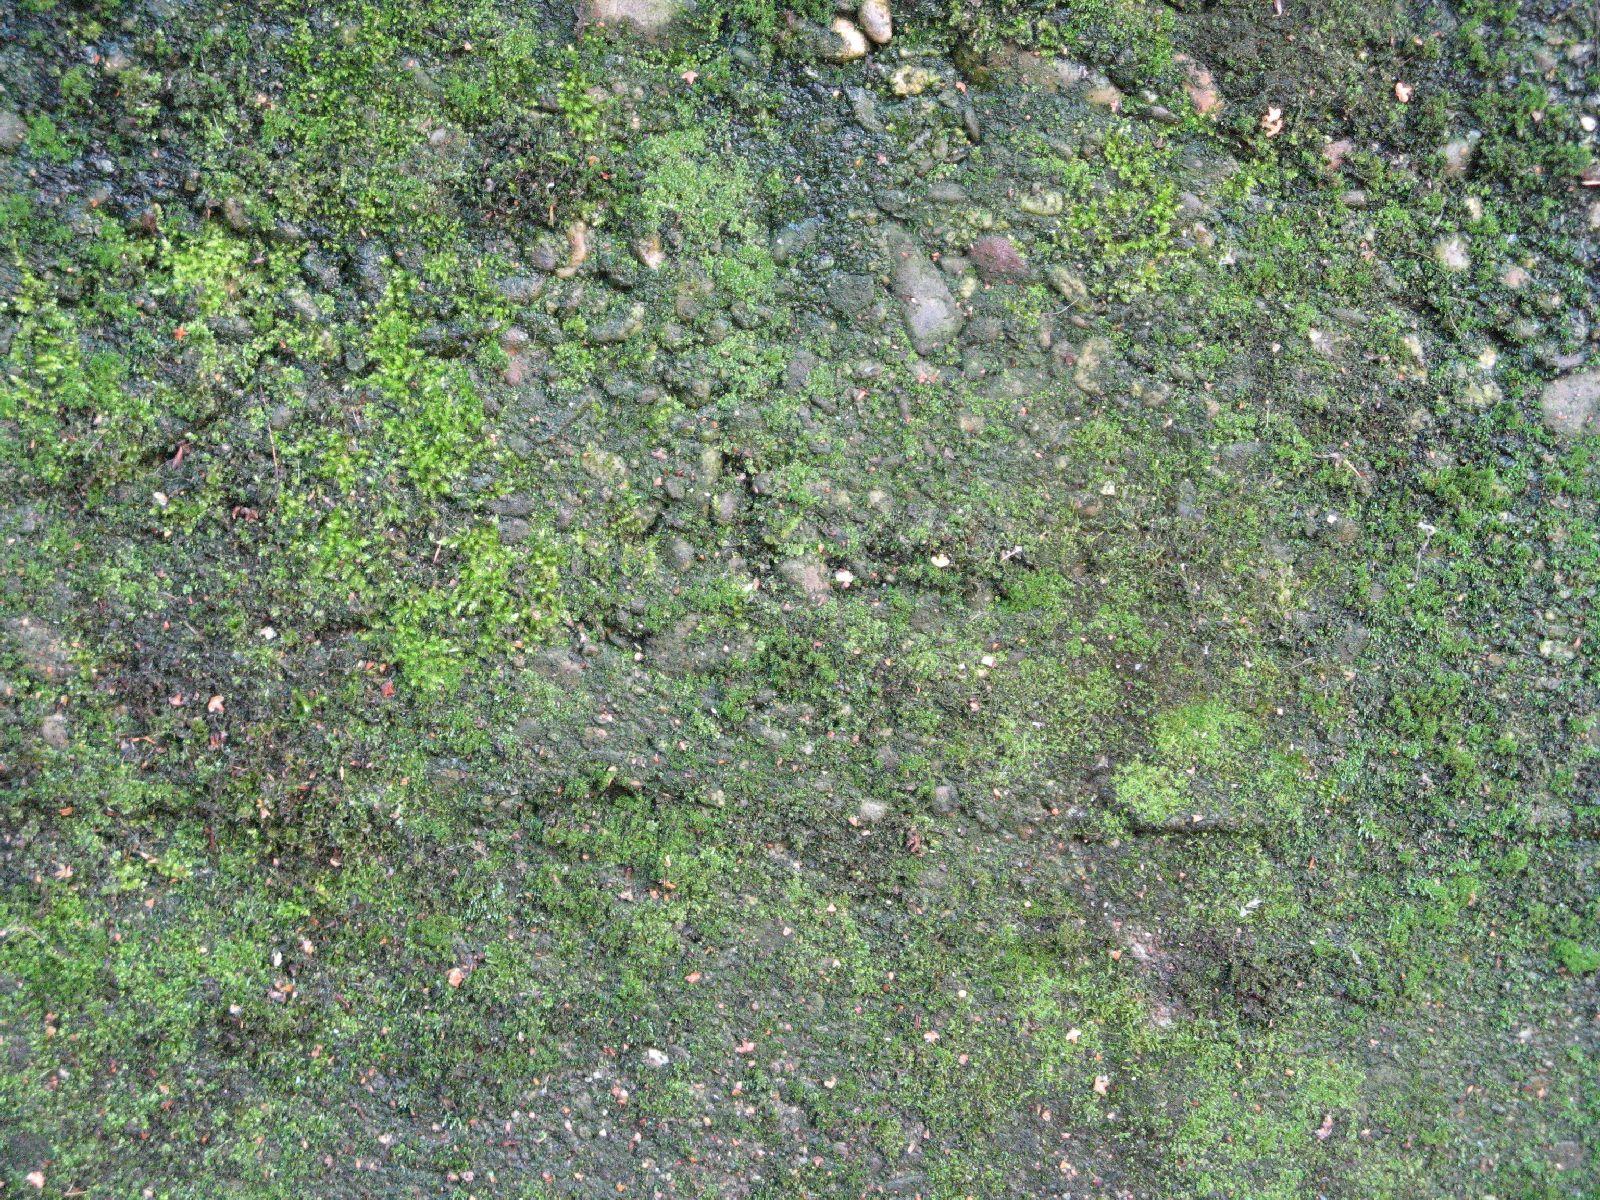 Boden-Gras-Moos-Blumen_Textur_B_00790